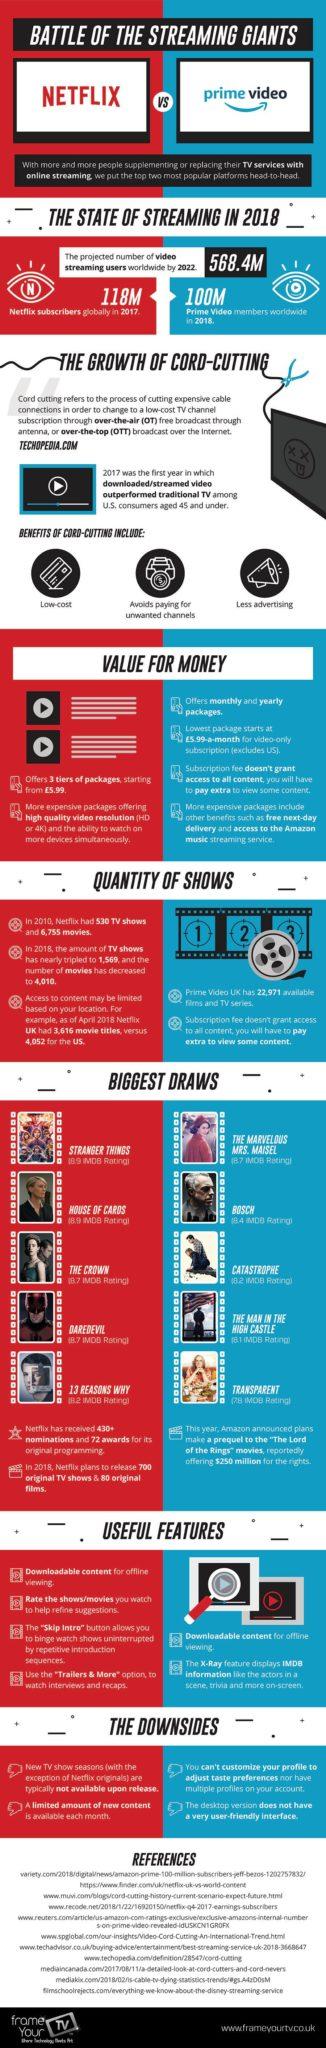 Battle-of-the-Streaming-Giants-Netflix-vs-Amazon-Prime